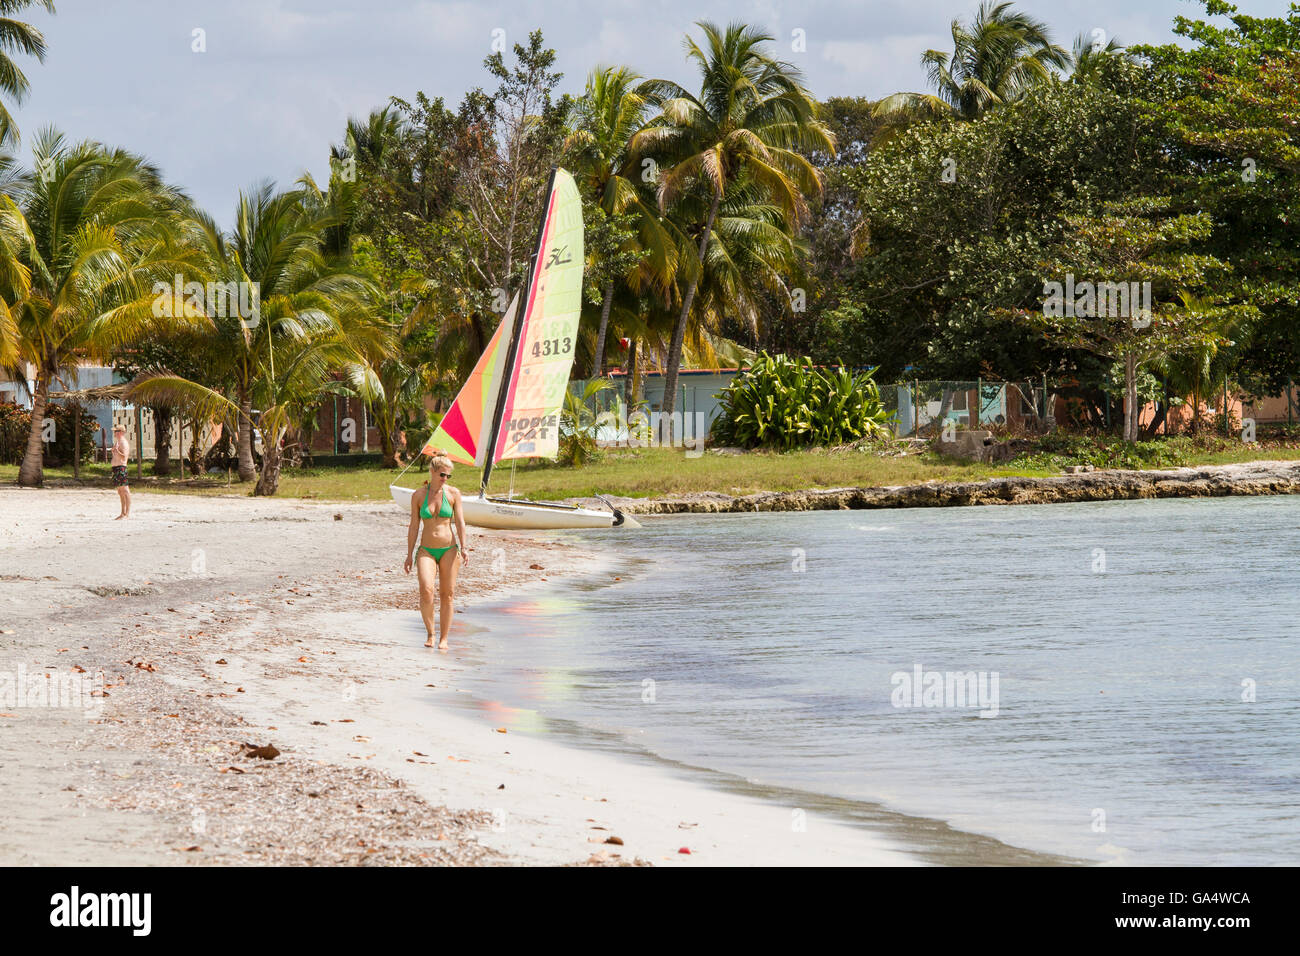 Woman in bikini walking along beach, with Hobie Cat and man in the background, at Playa Larga, Cuba - Stock Image